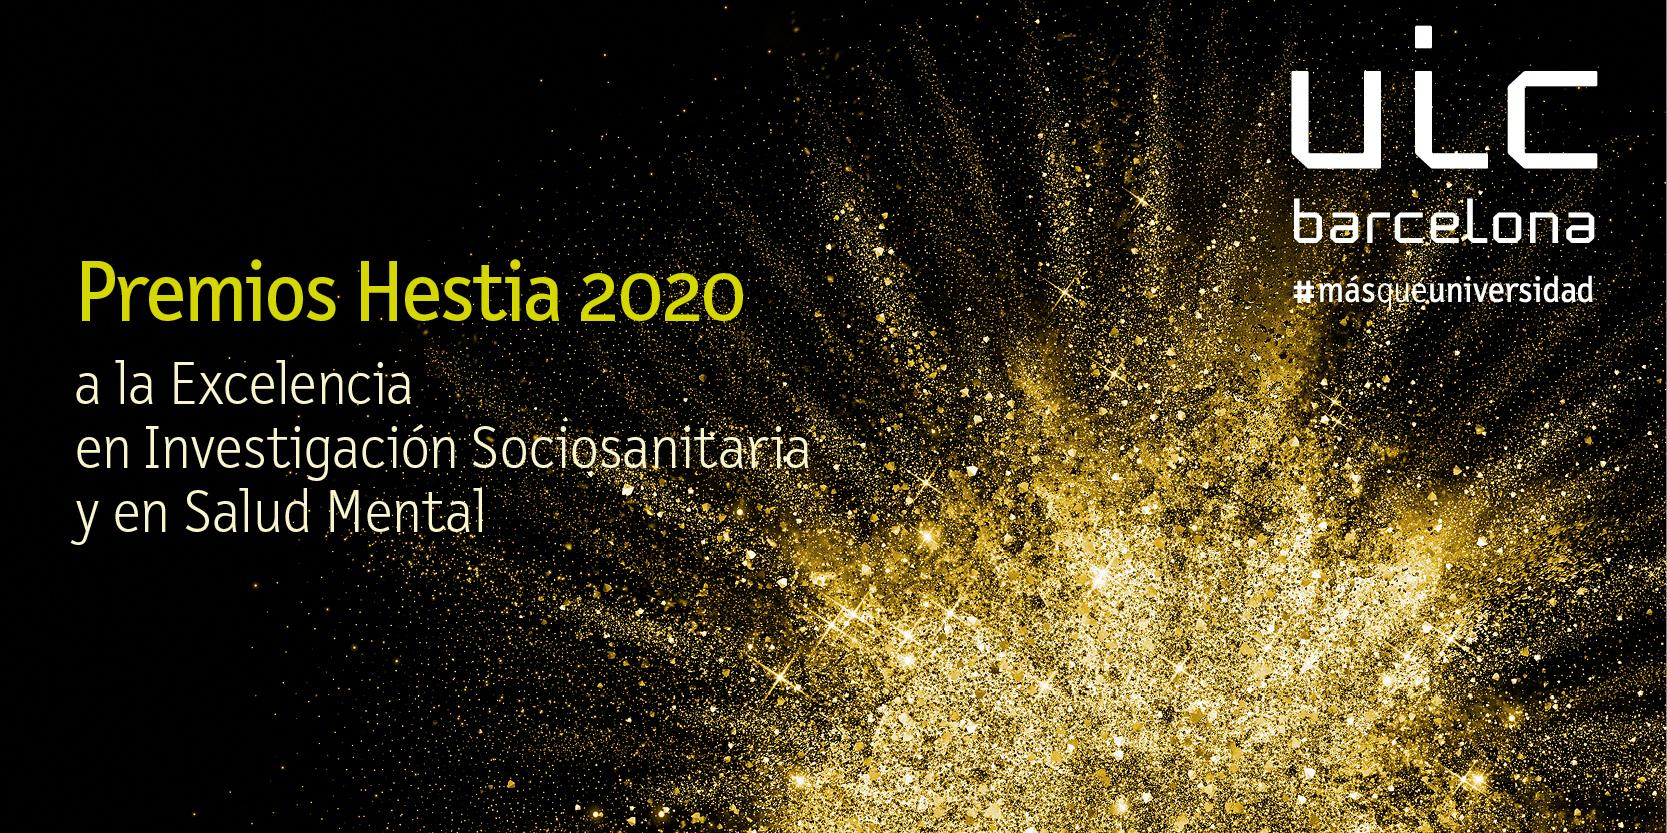 FMCSI HESTIA Premis 2020 Capçalera Mailchimp CAST